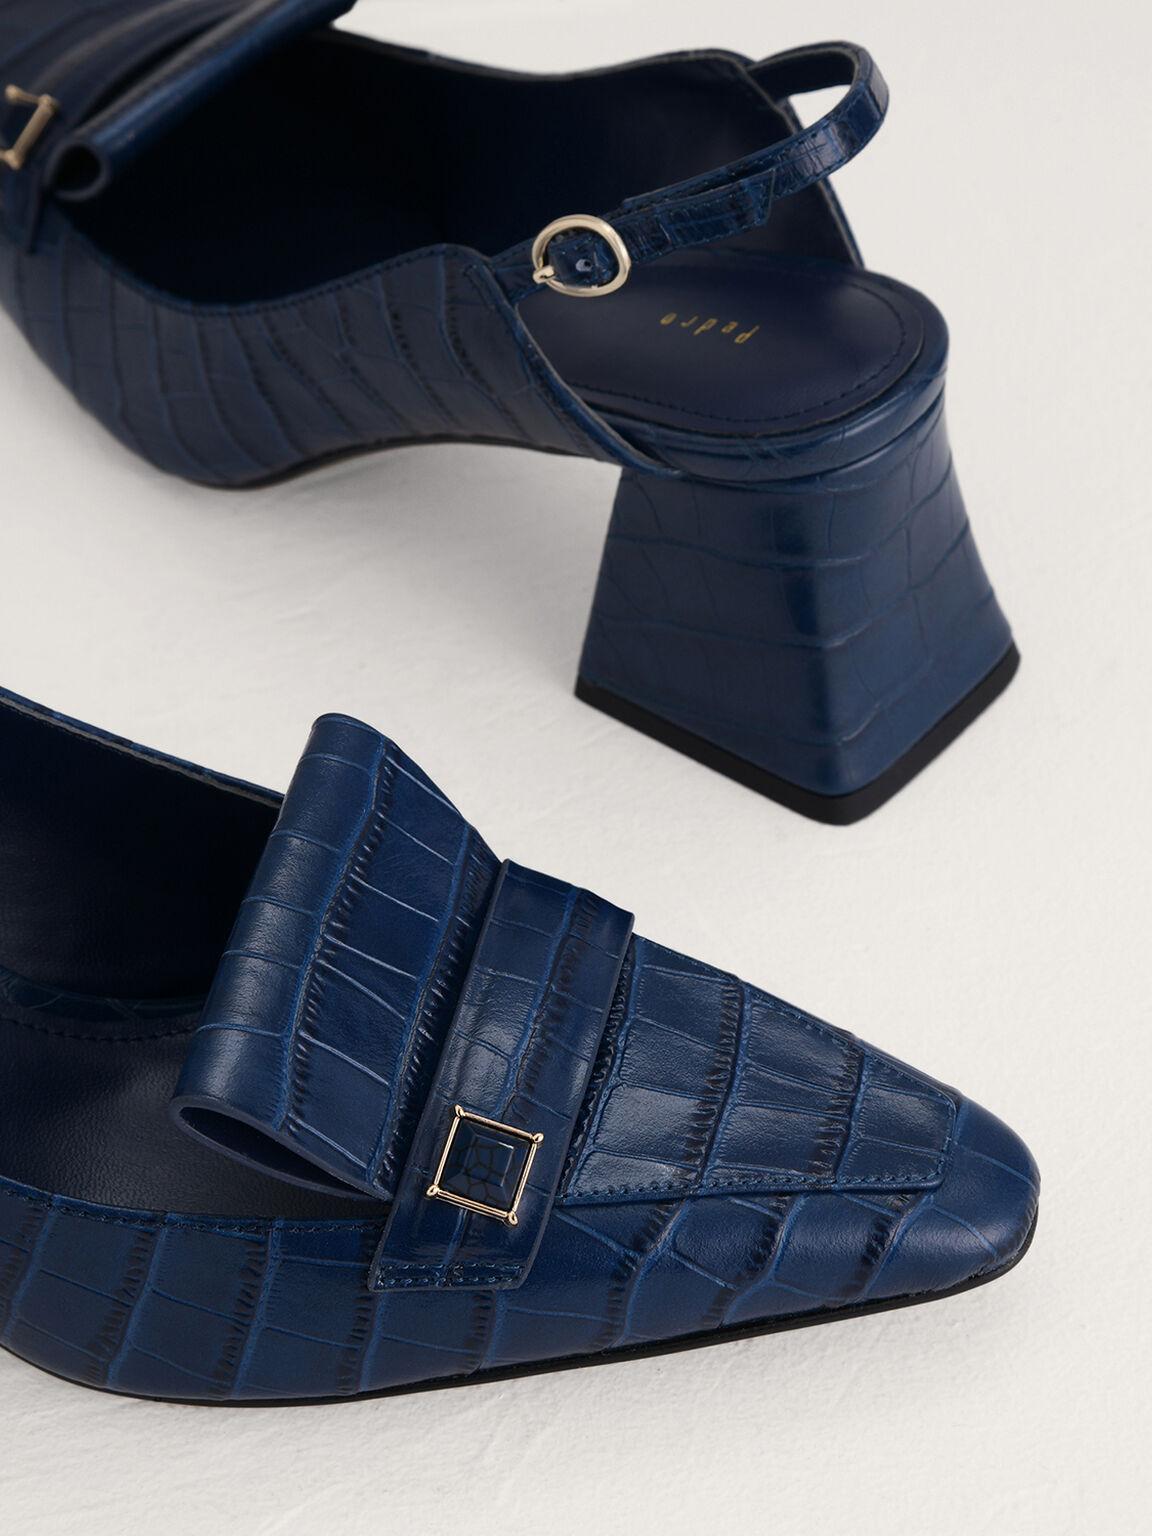 Croc-Effect Leather Slingback Pumps, Navy, hi-res